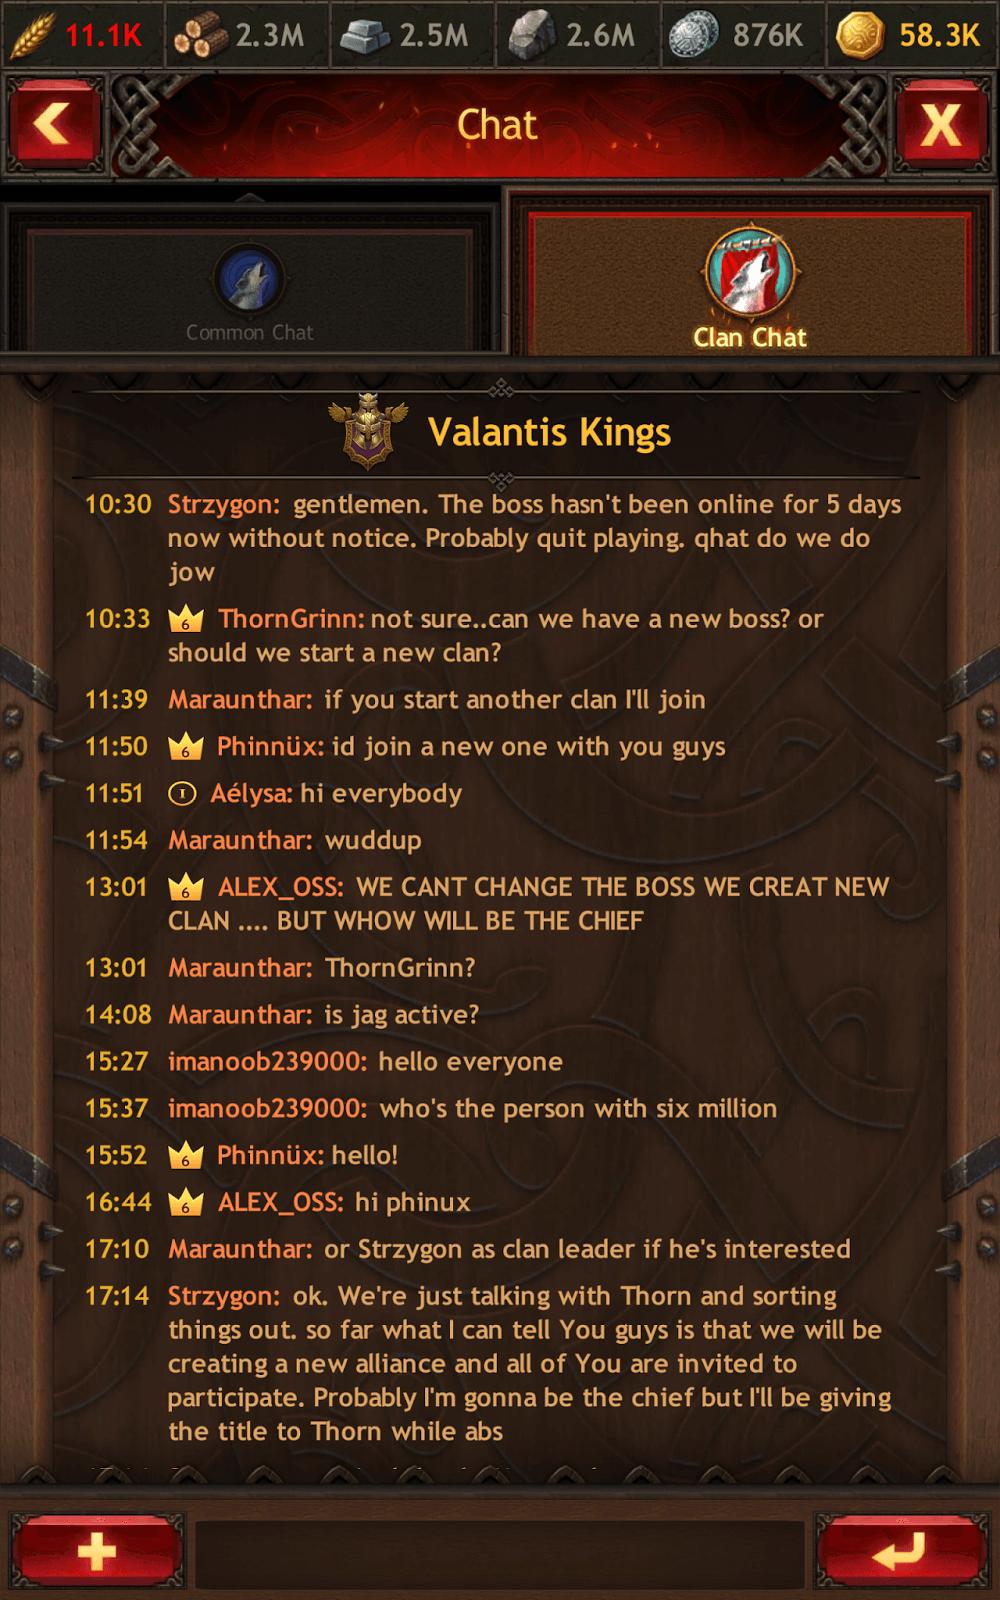 Valantis Kings Disbanding